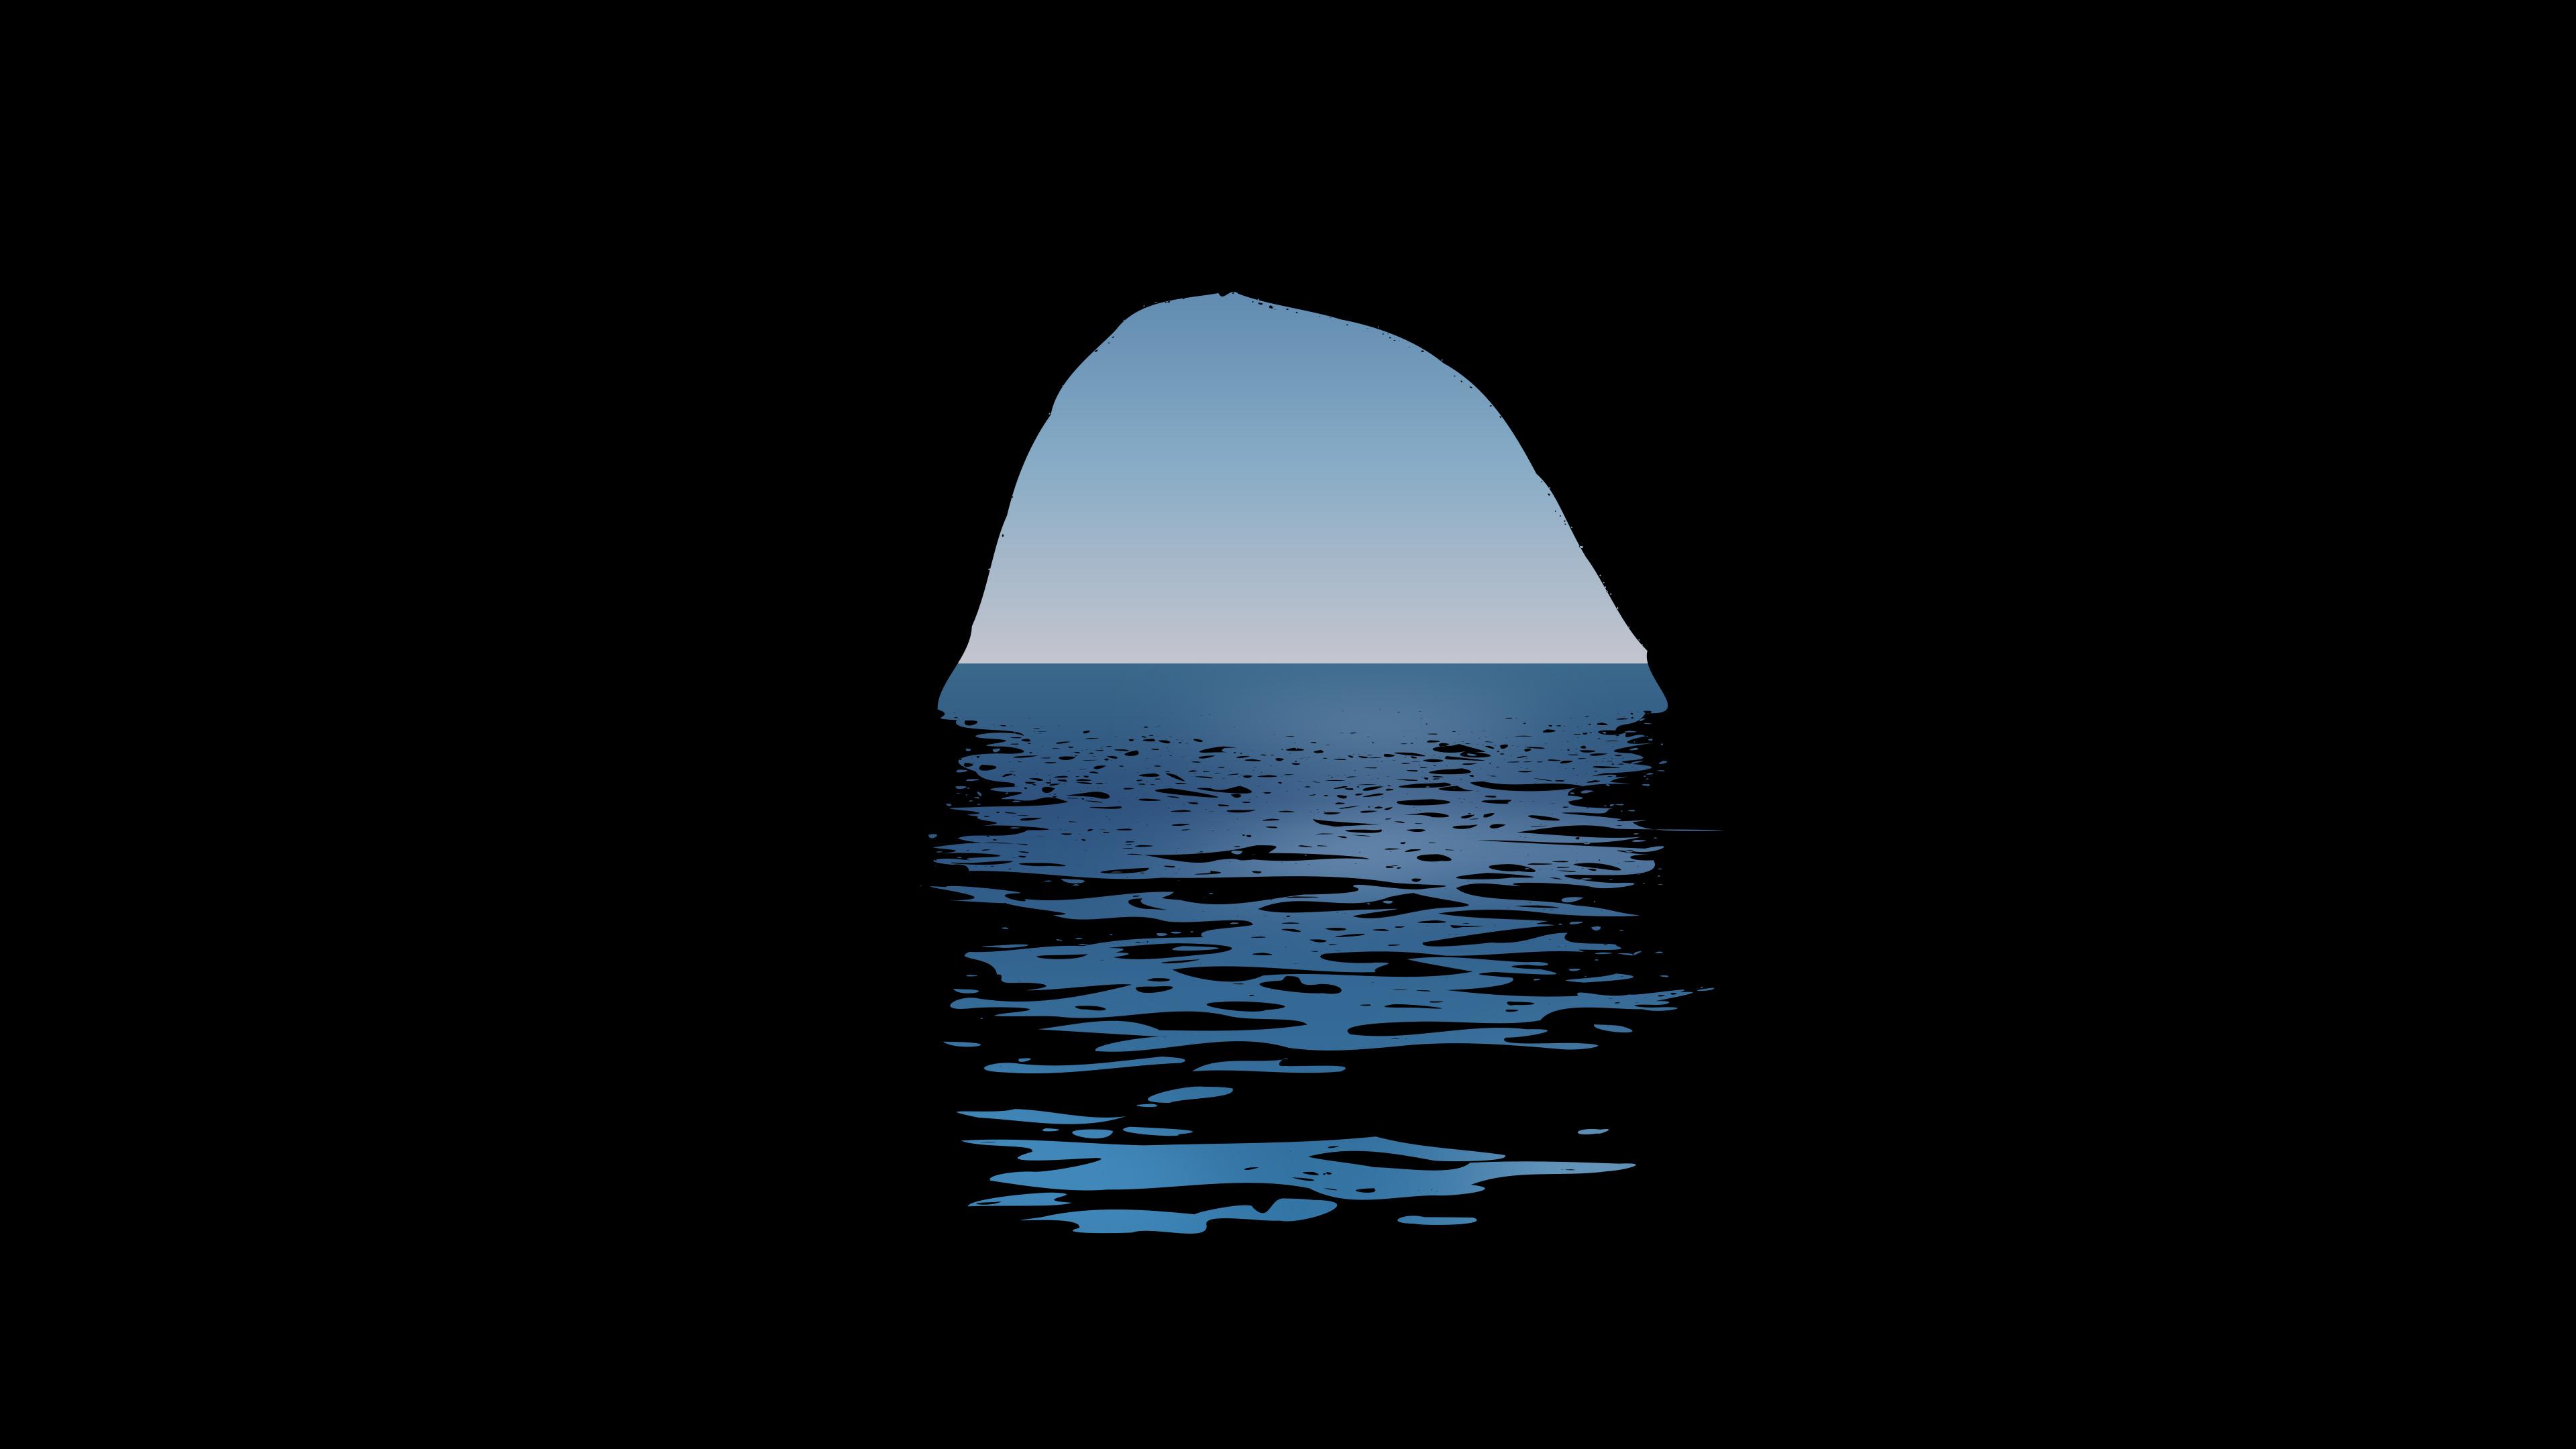 Cave Minimalist 4k, HD Artist, 4k Wallpapers, Images ...